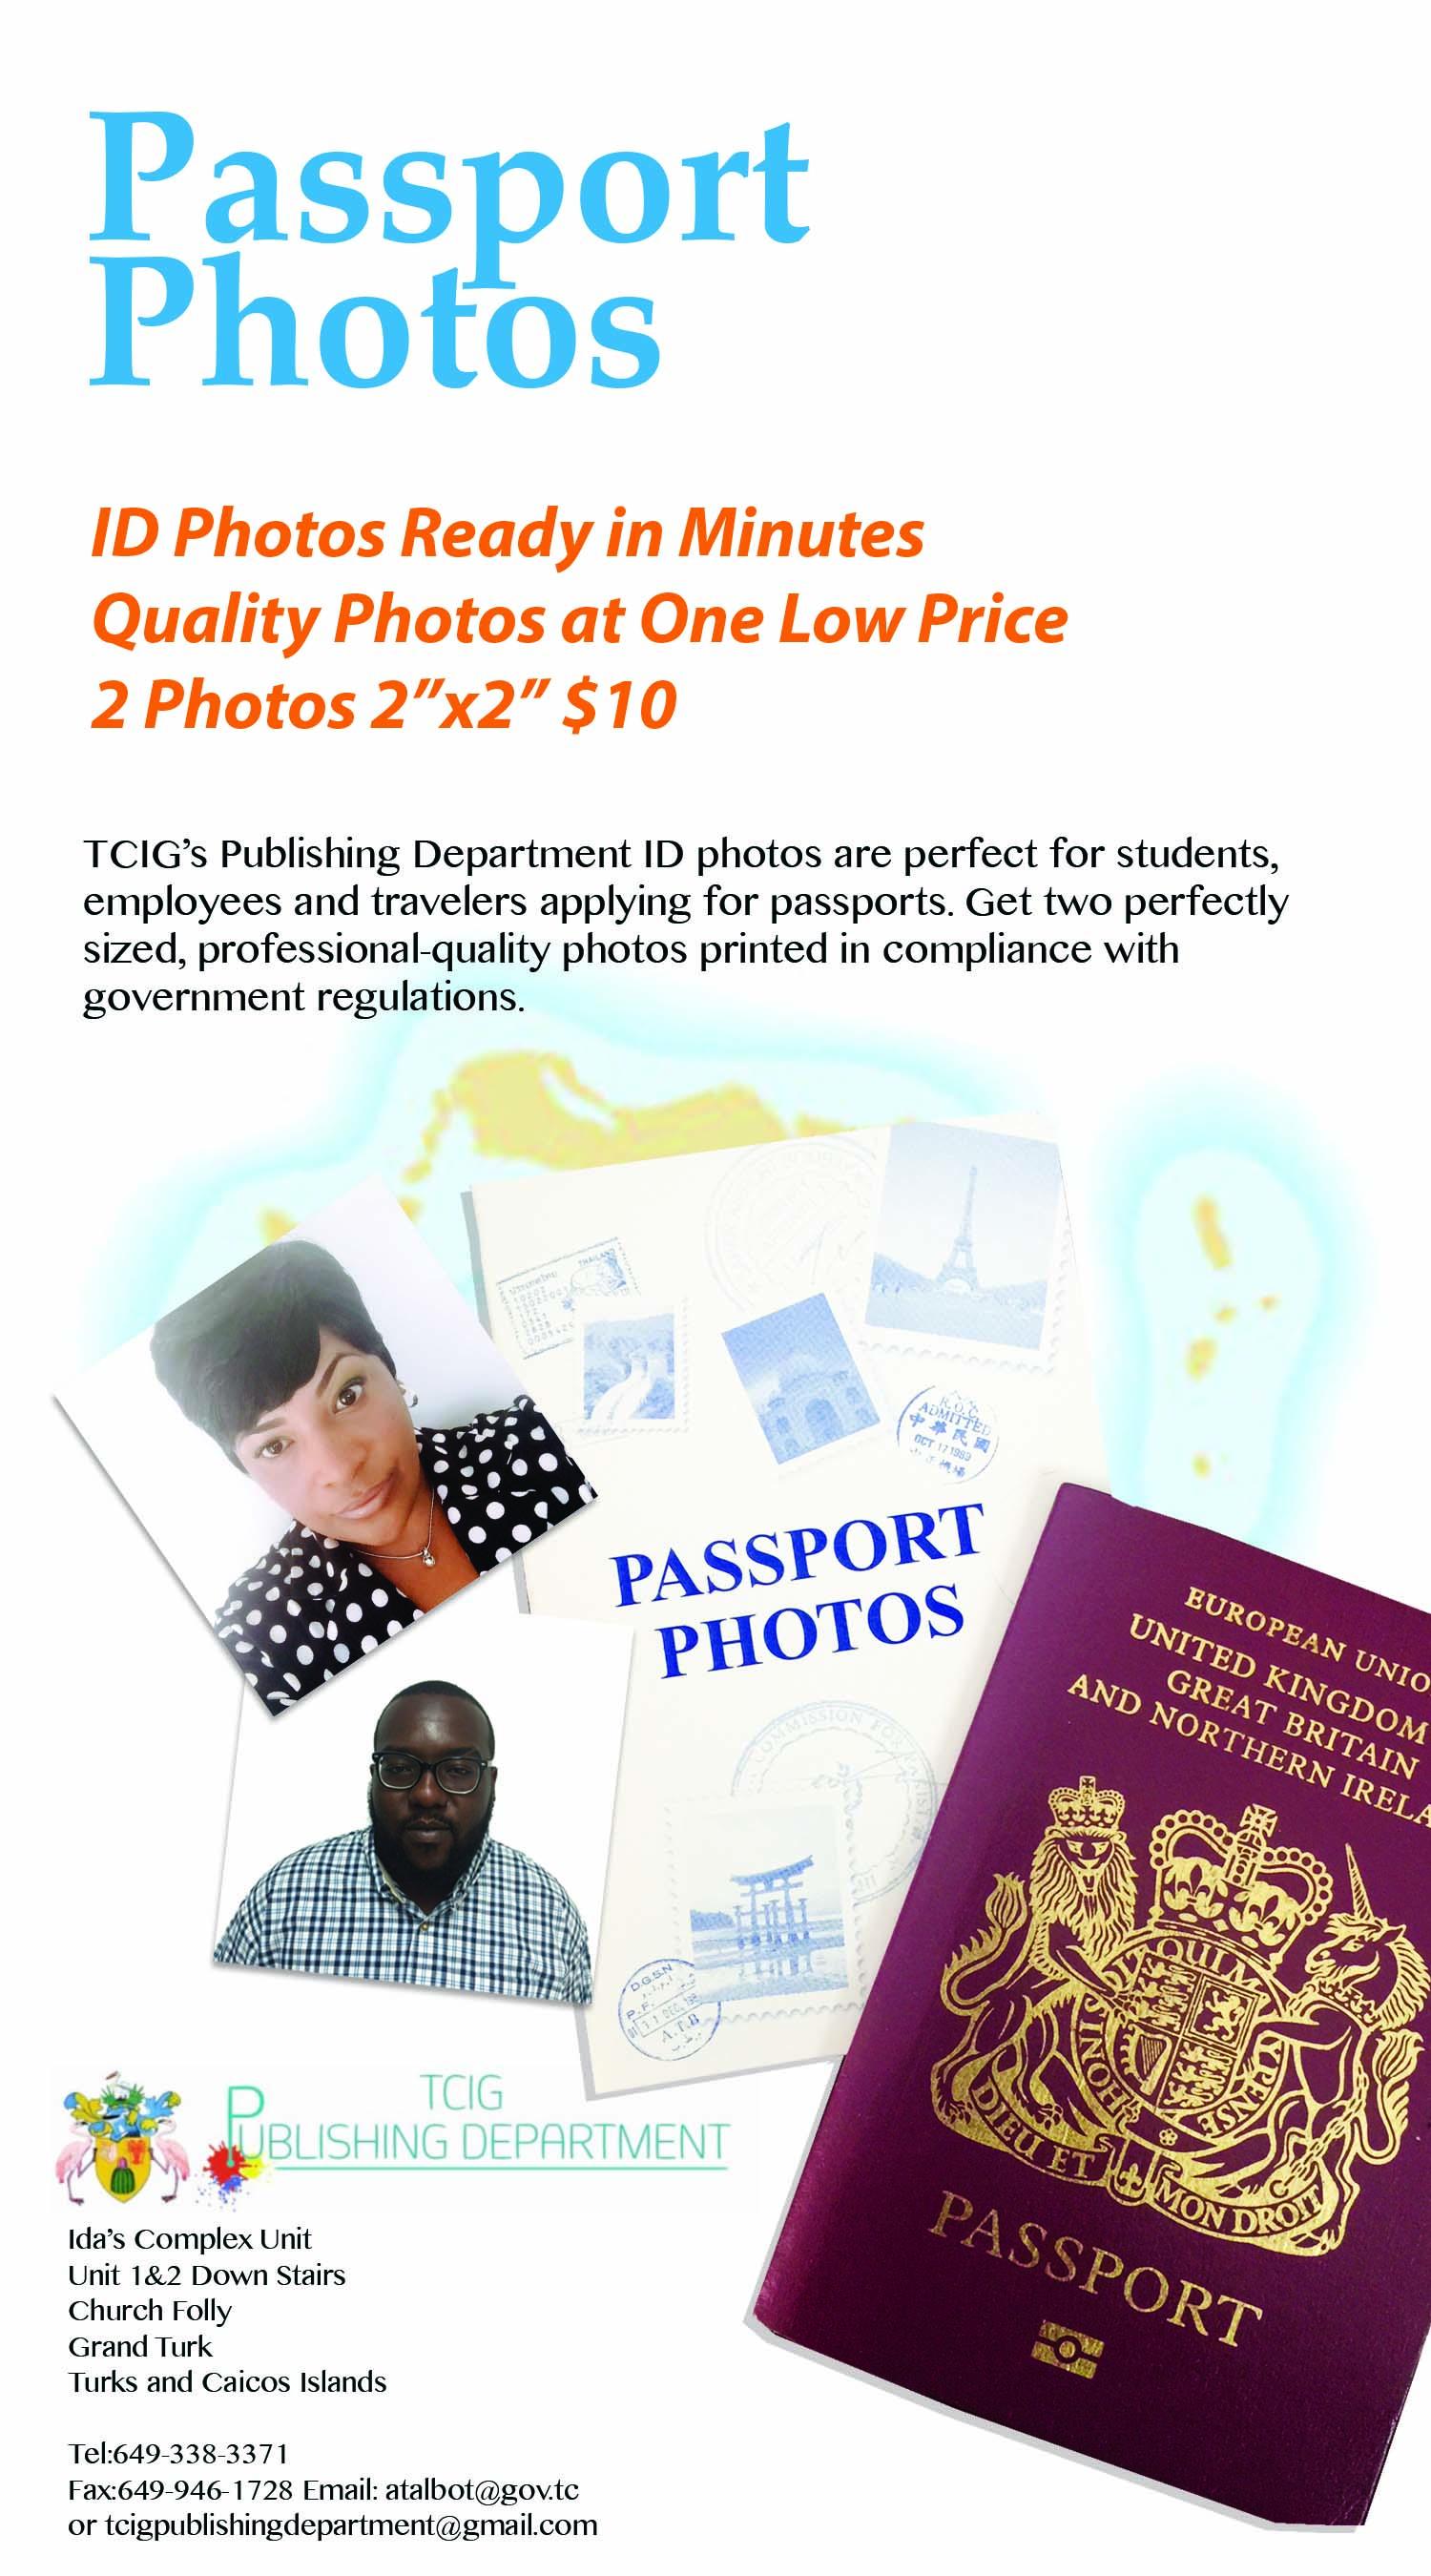 Create Get passport photos printed online